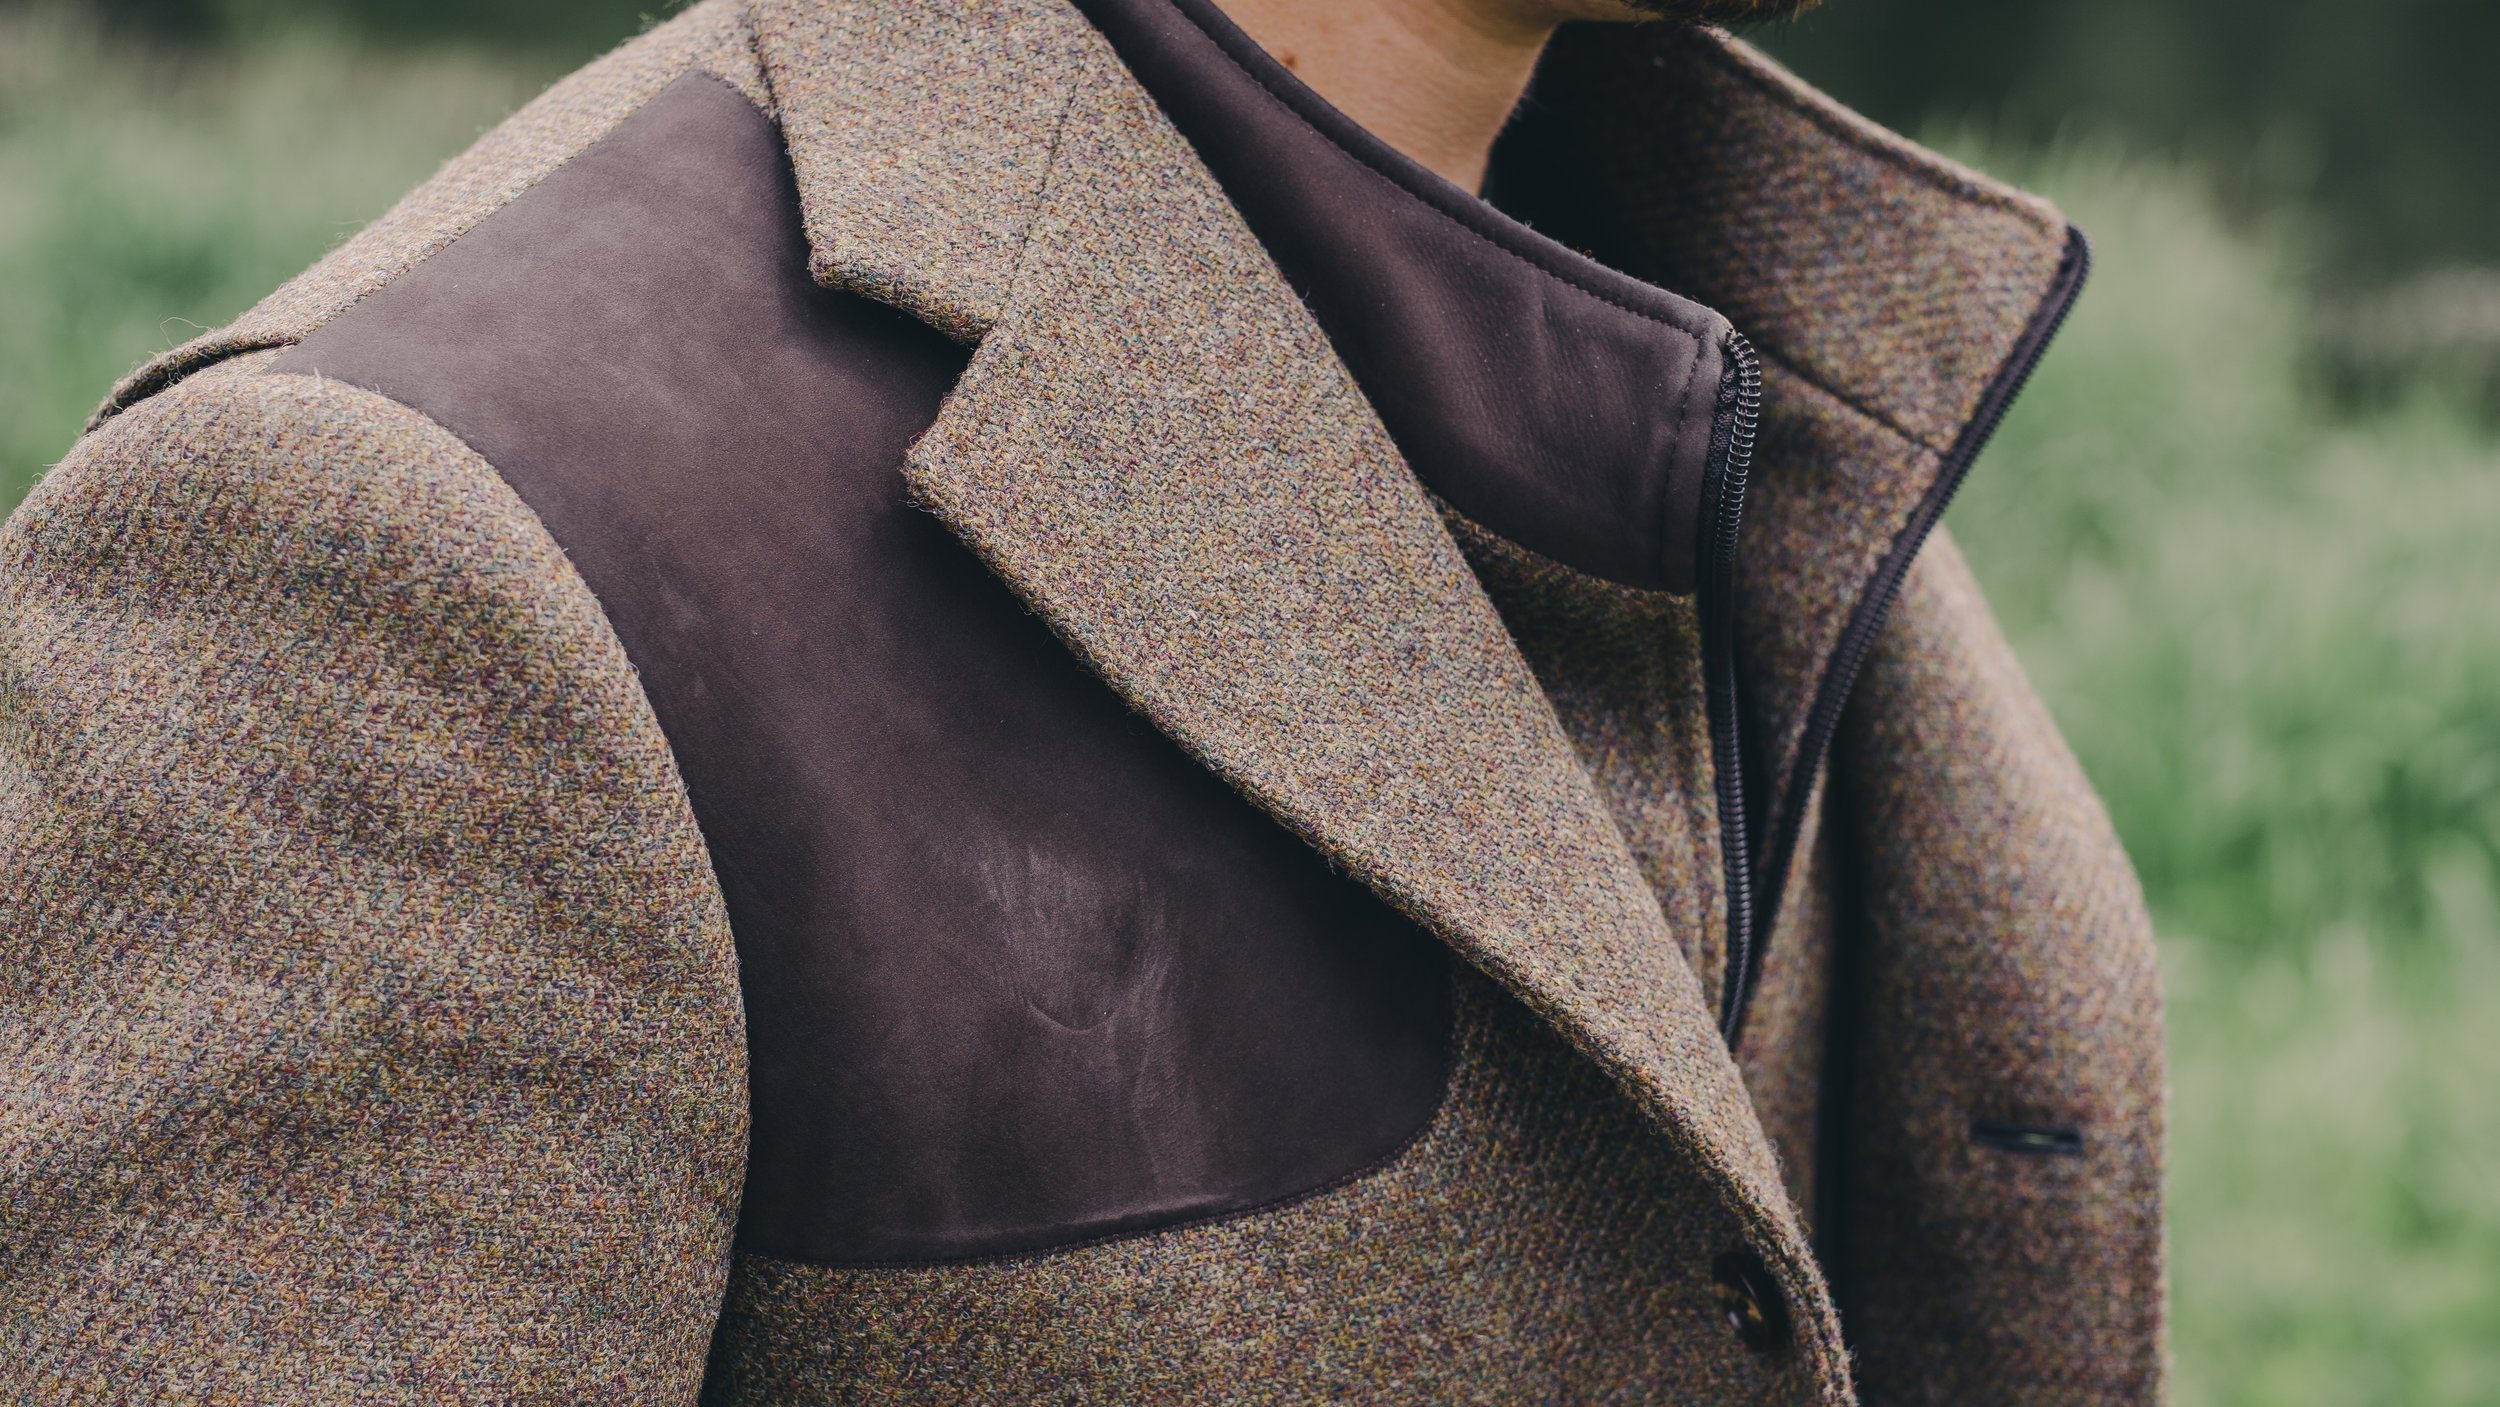 bespoke shooting jacket suede leather